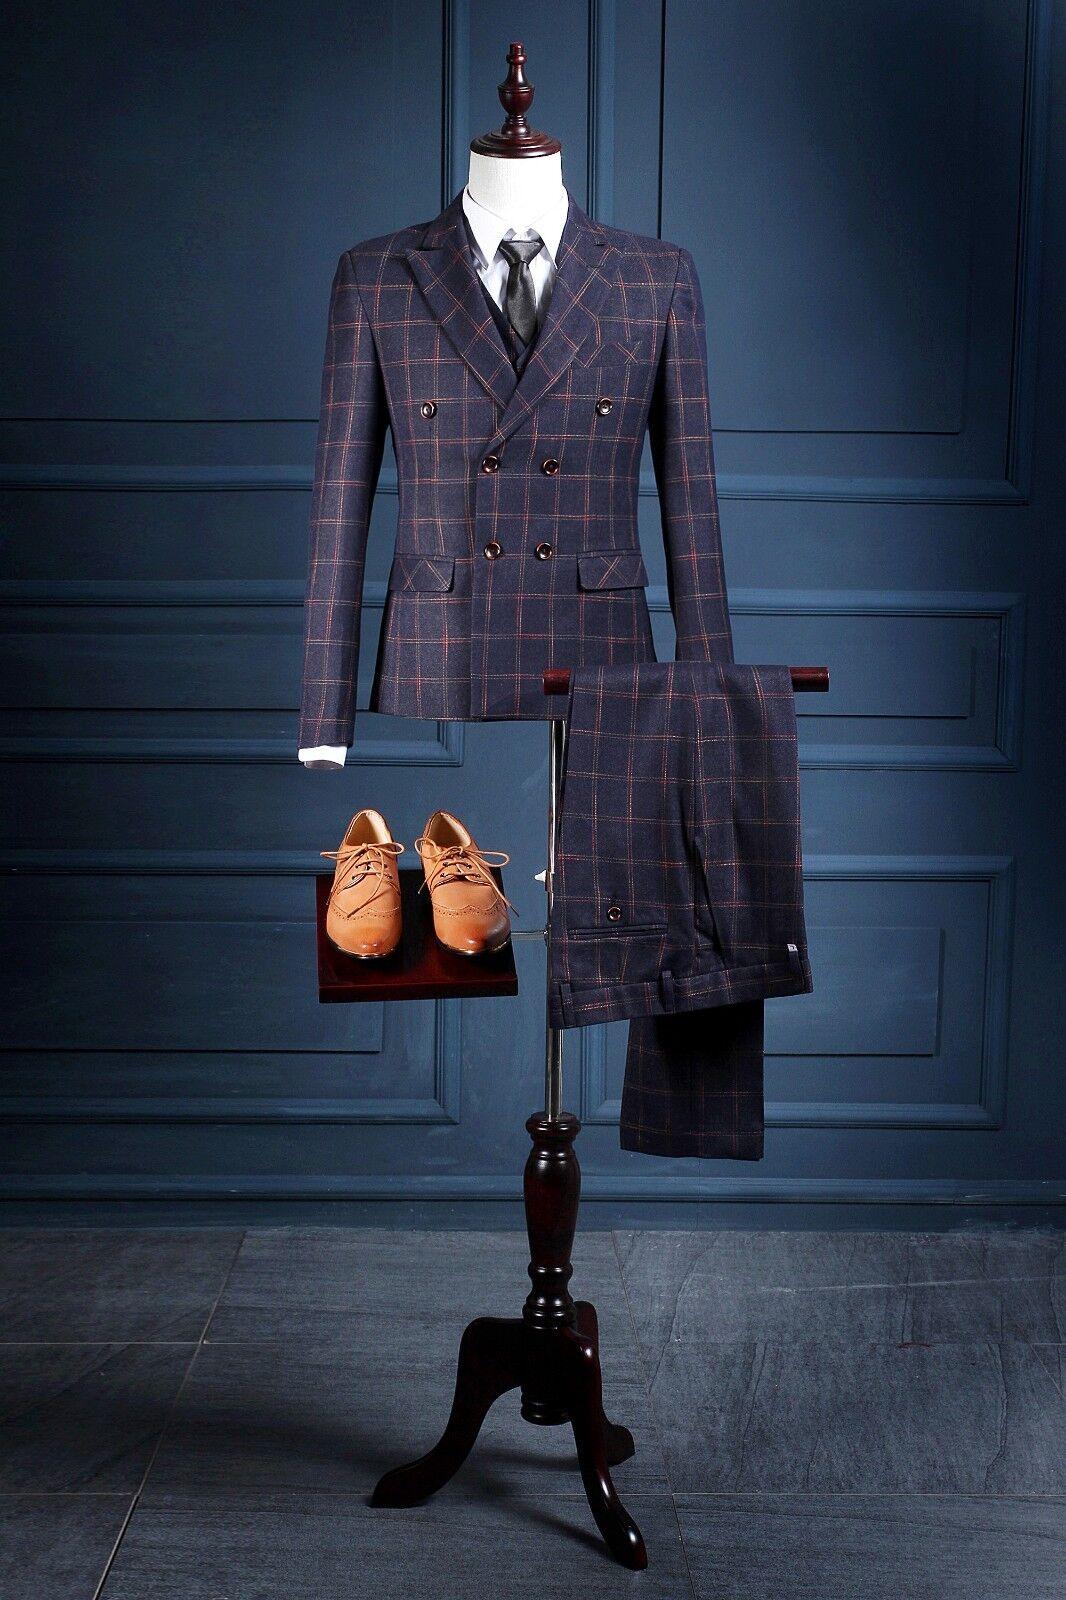 New Groom Tuxeds Double Breasted Best Man Groomsmen Suit Men Plaid Business Suit